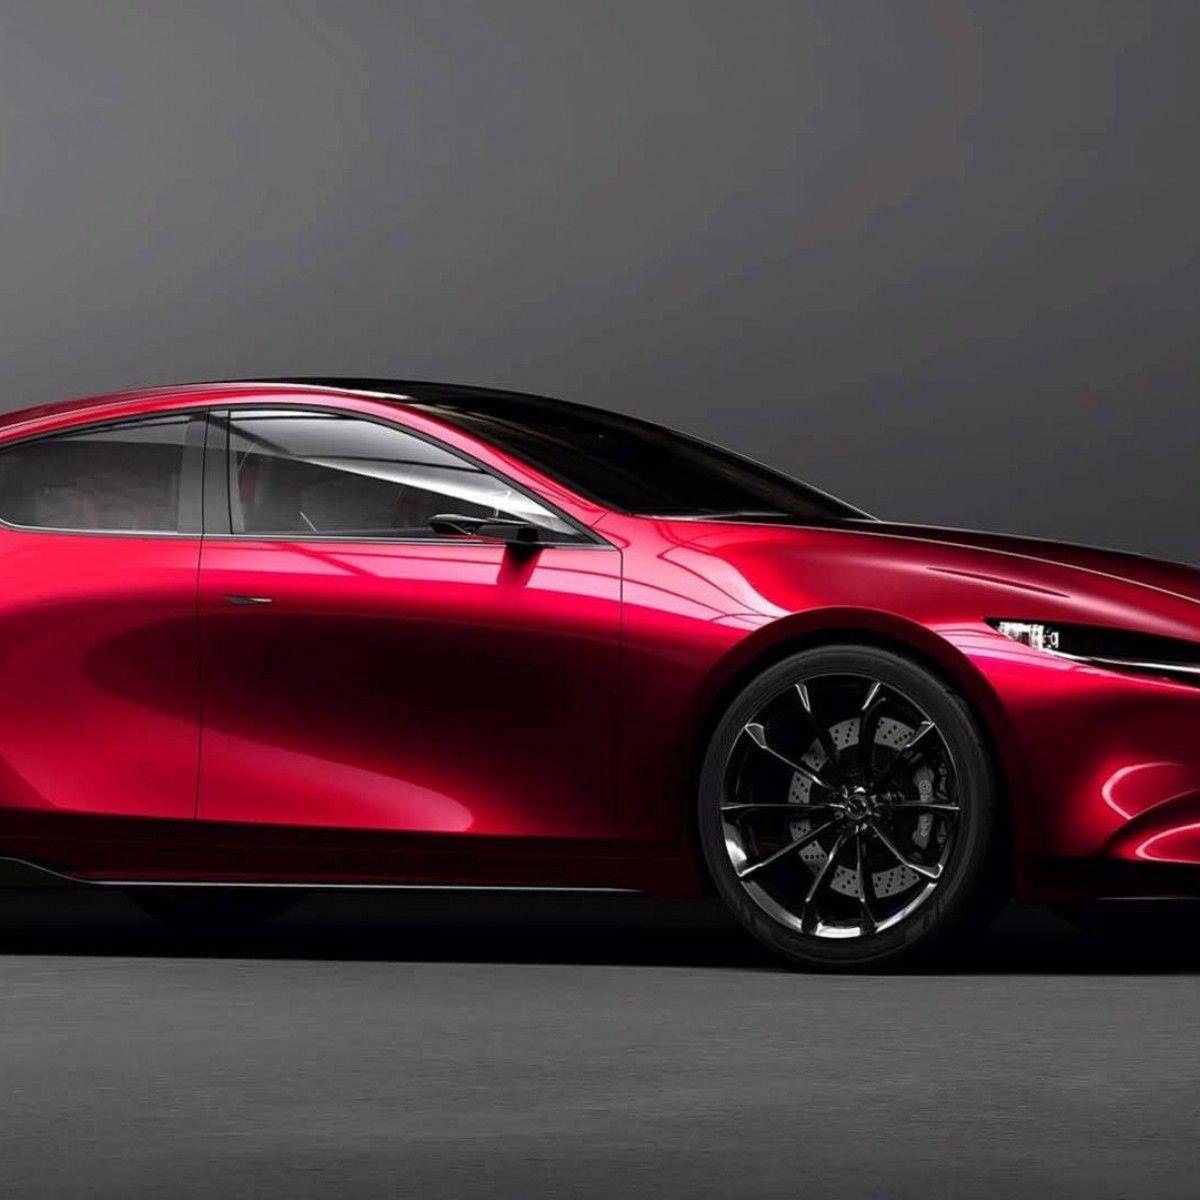 Pin On New Model Car 2020